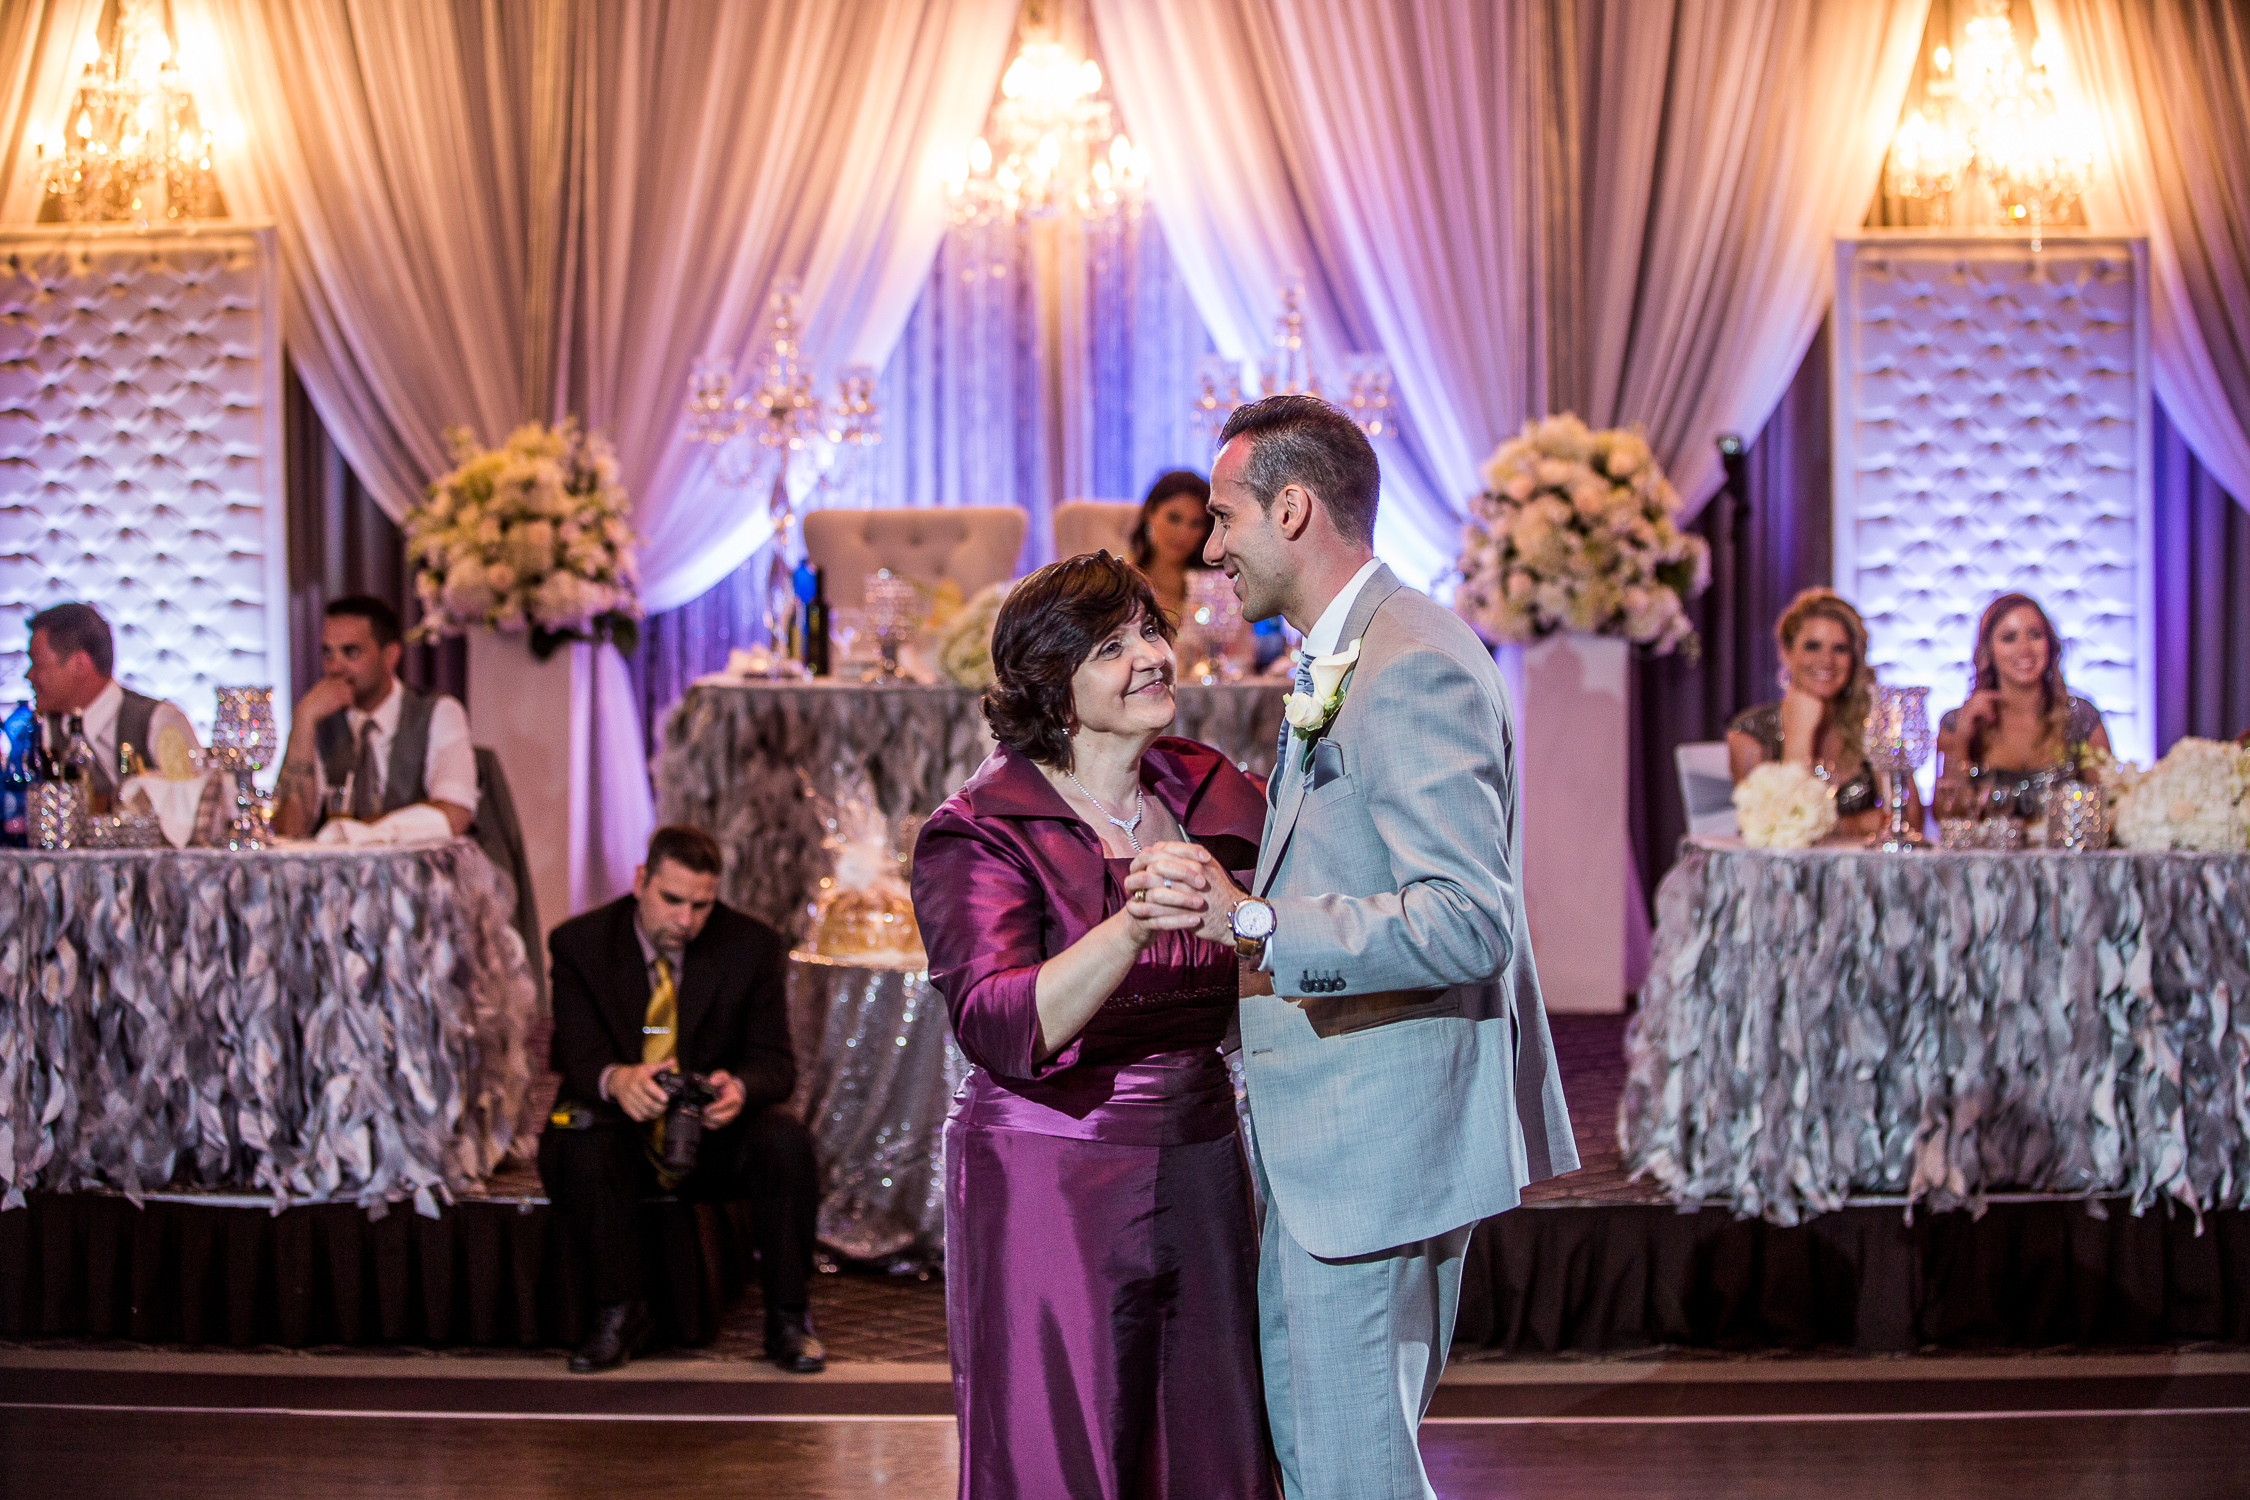 Paradise-Banquet-Hall-Wedding-Vaughan-Ontario-0076.jpg